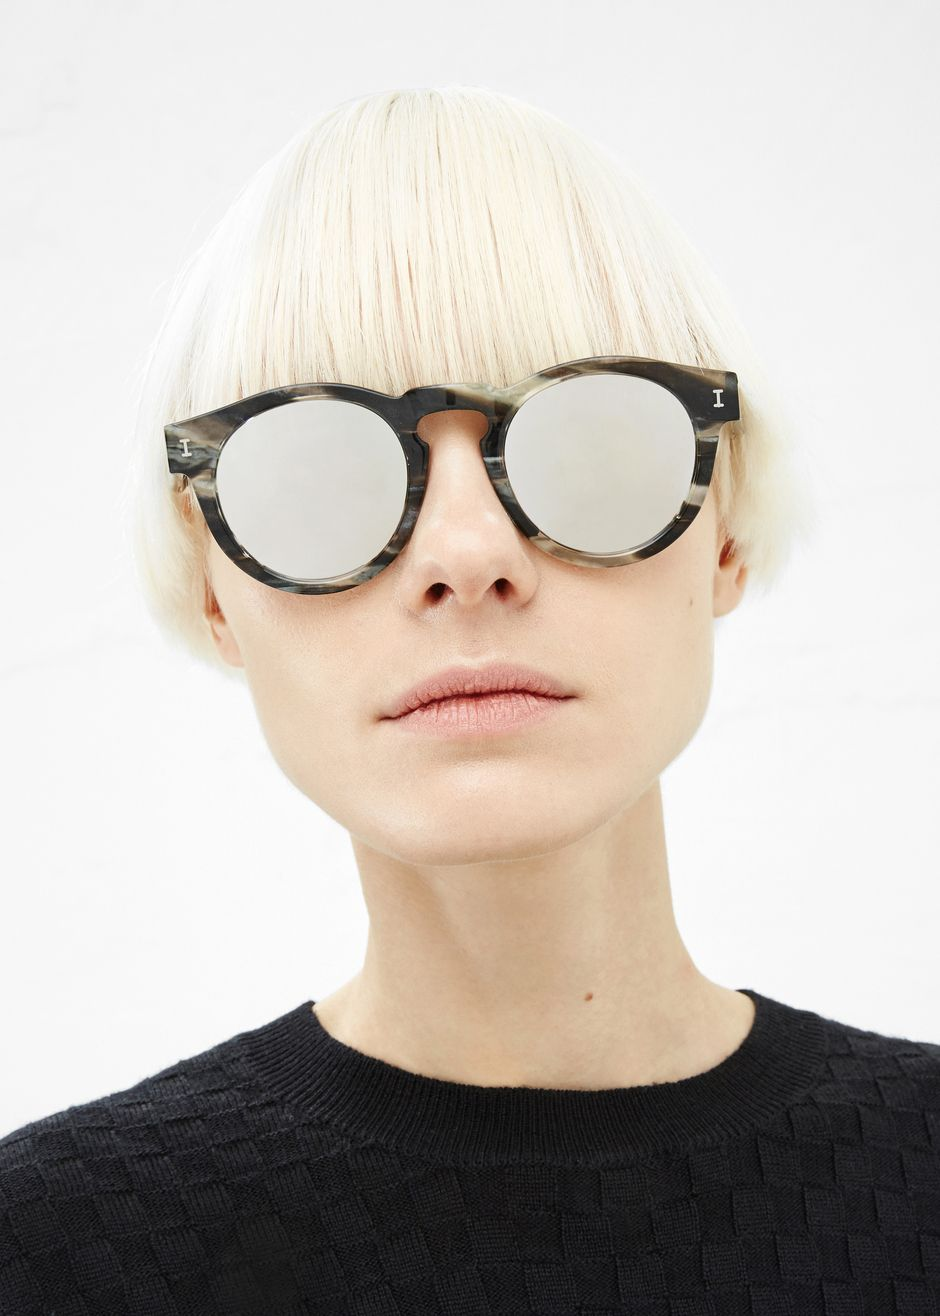 092484d530f Illesteva Leonard Sunglasses (Marmor   Silver Mirror) RAYBANS  SUNGLASSES